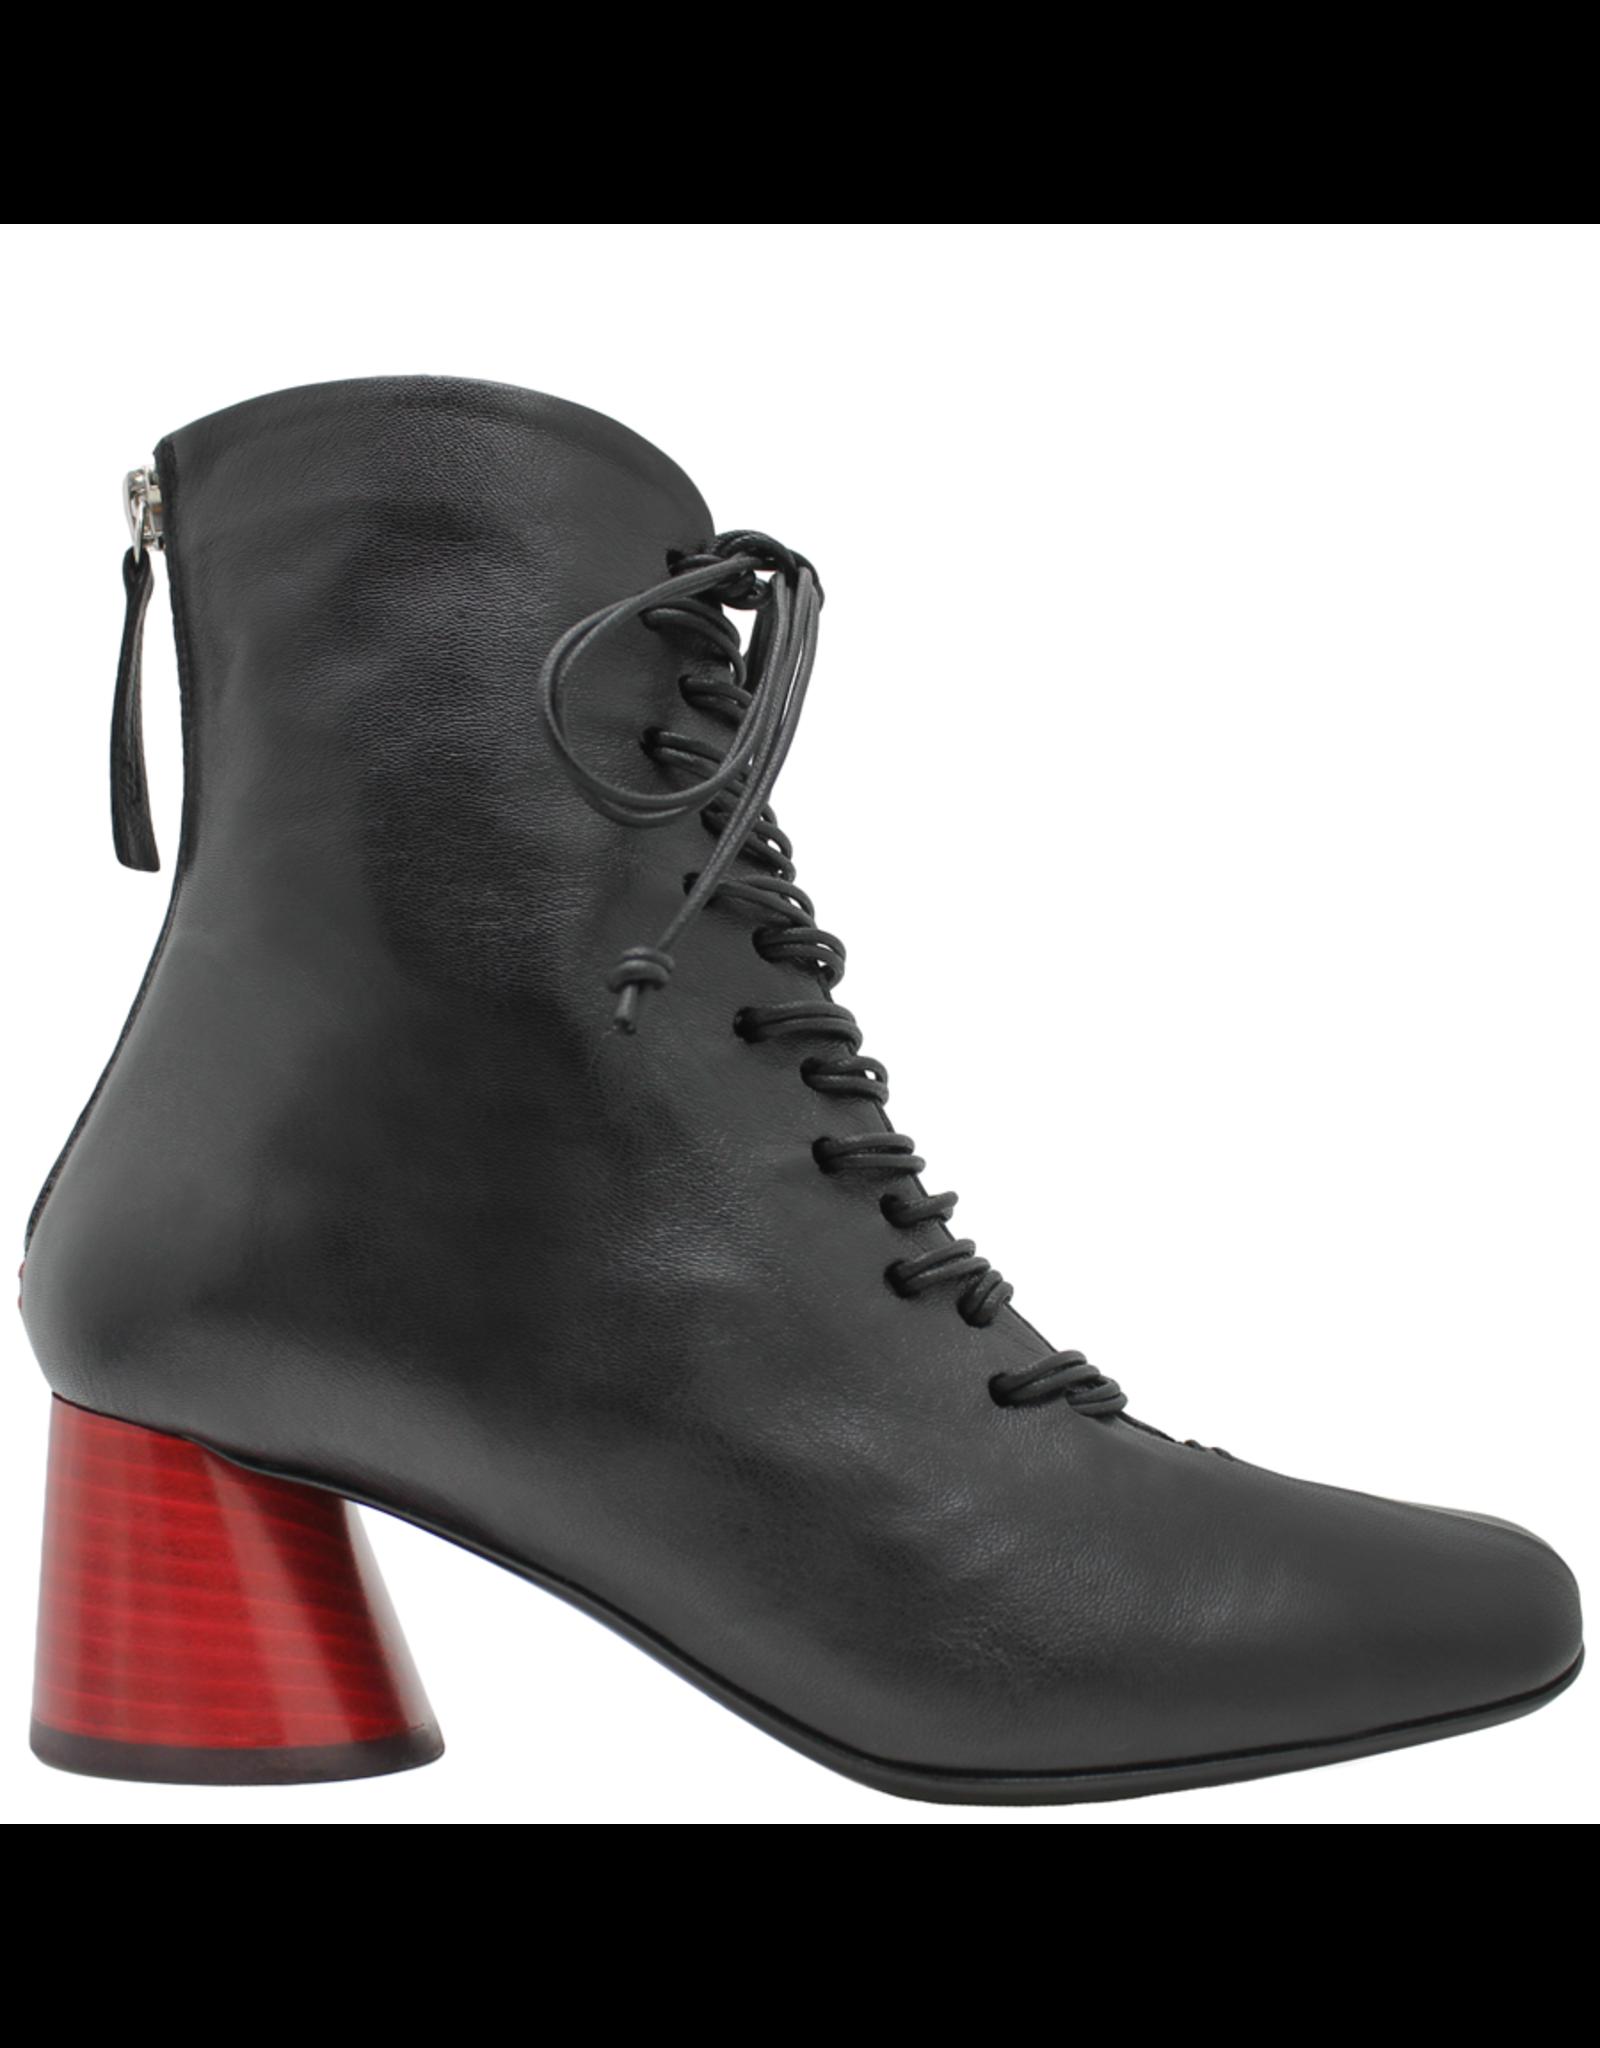 Halmanera Halmanera Black Square Toe Lace-Up Red Heel 2030